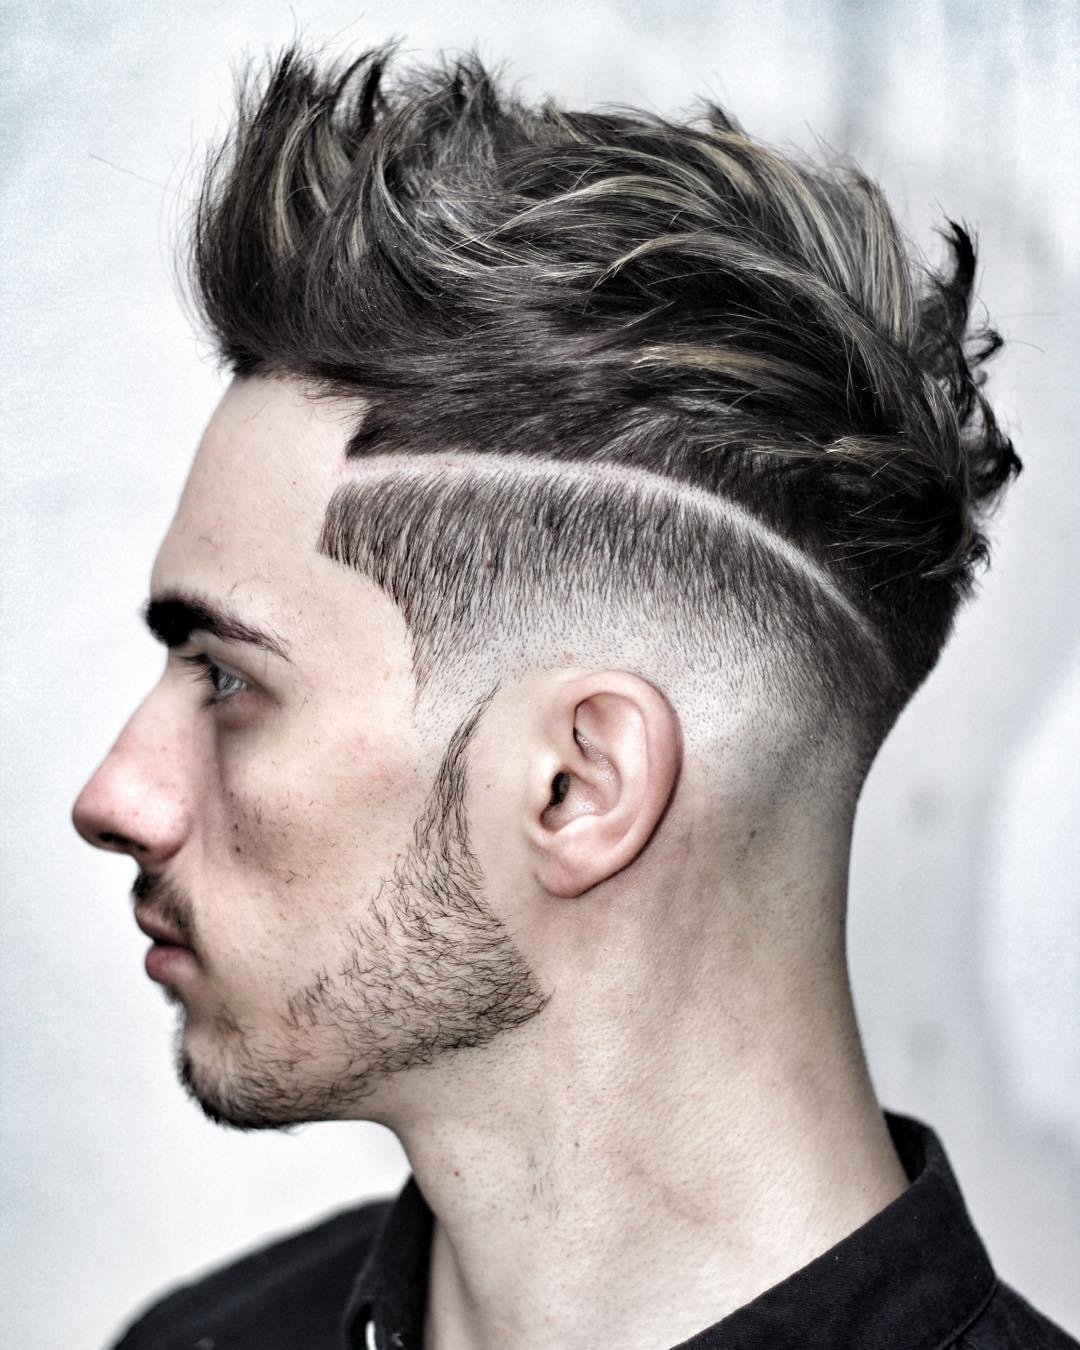 Awe Inspiring Short Hair Hairstyles And Haircuts For Men 2017 Short Hairstyles Gunalazisus